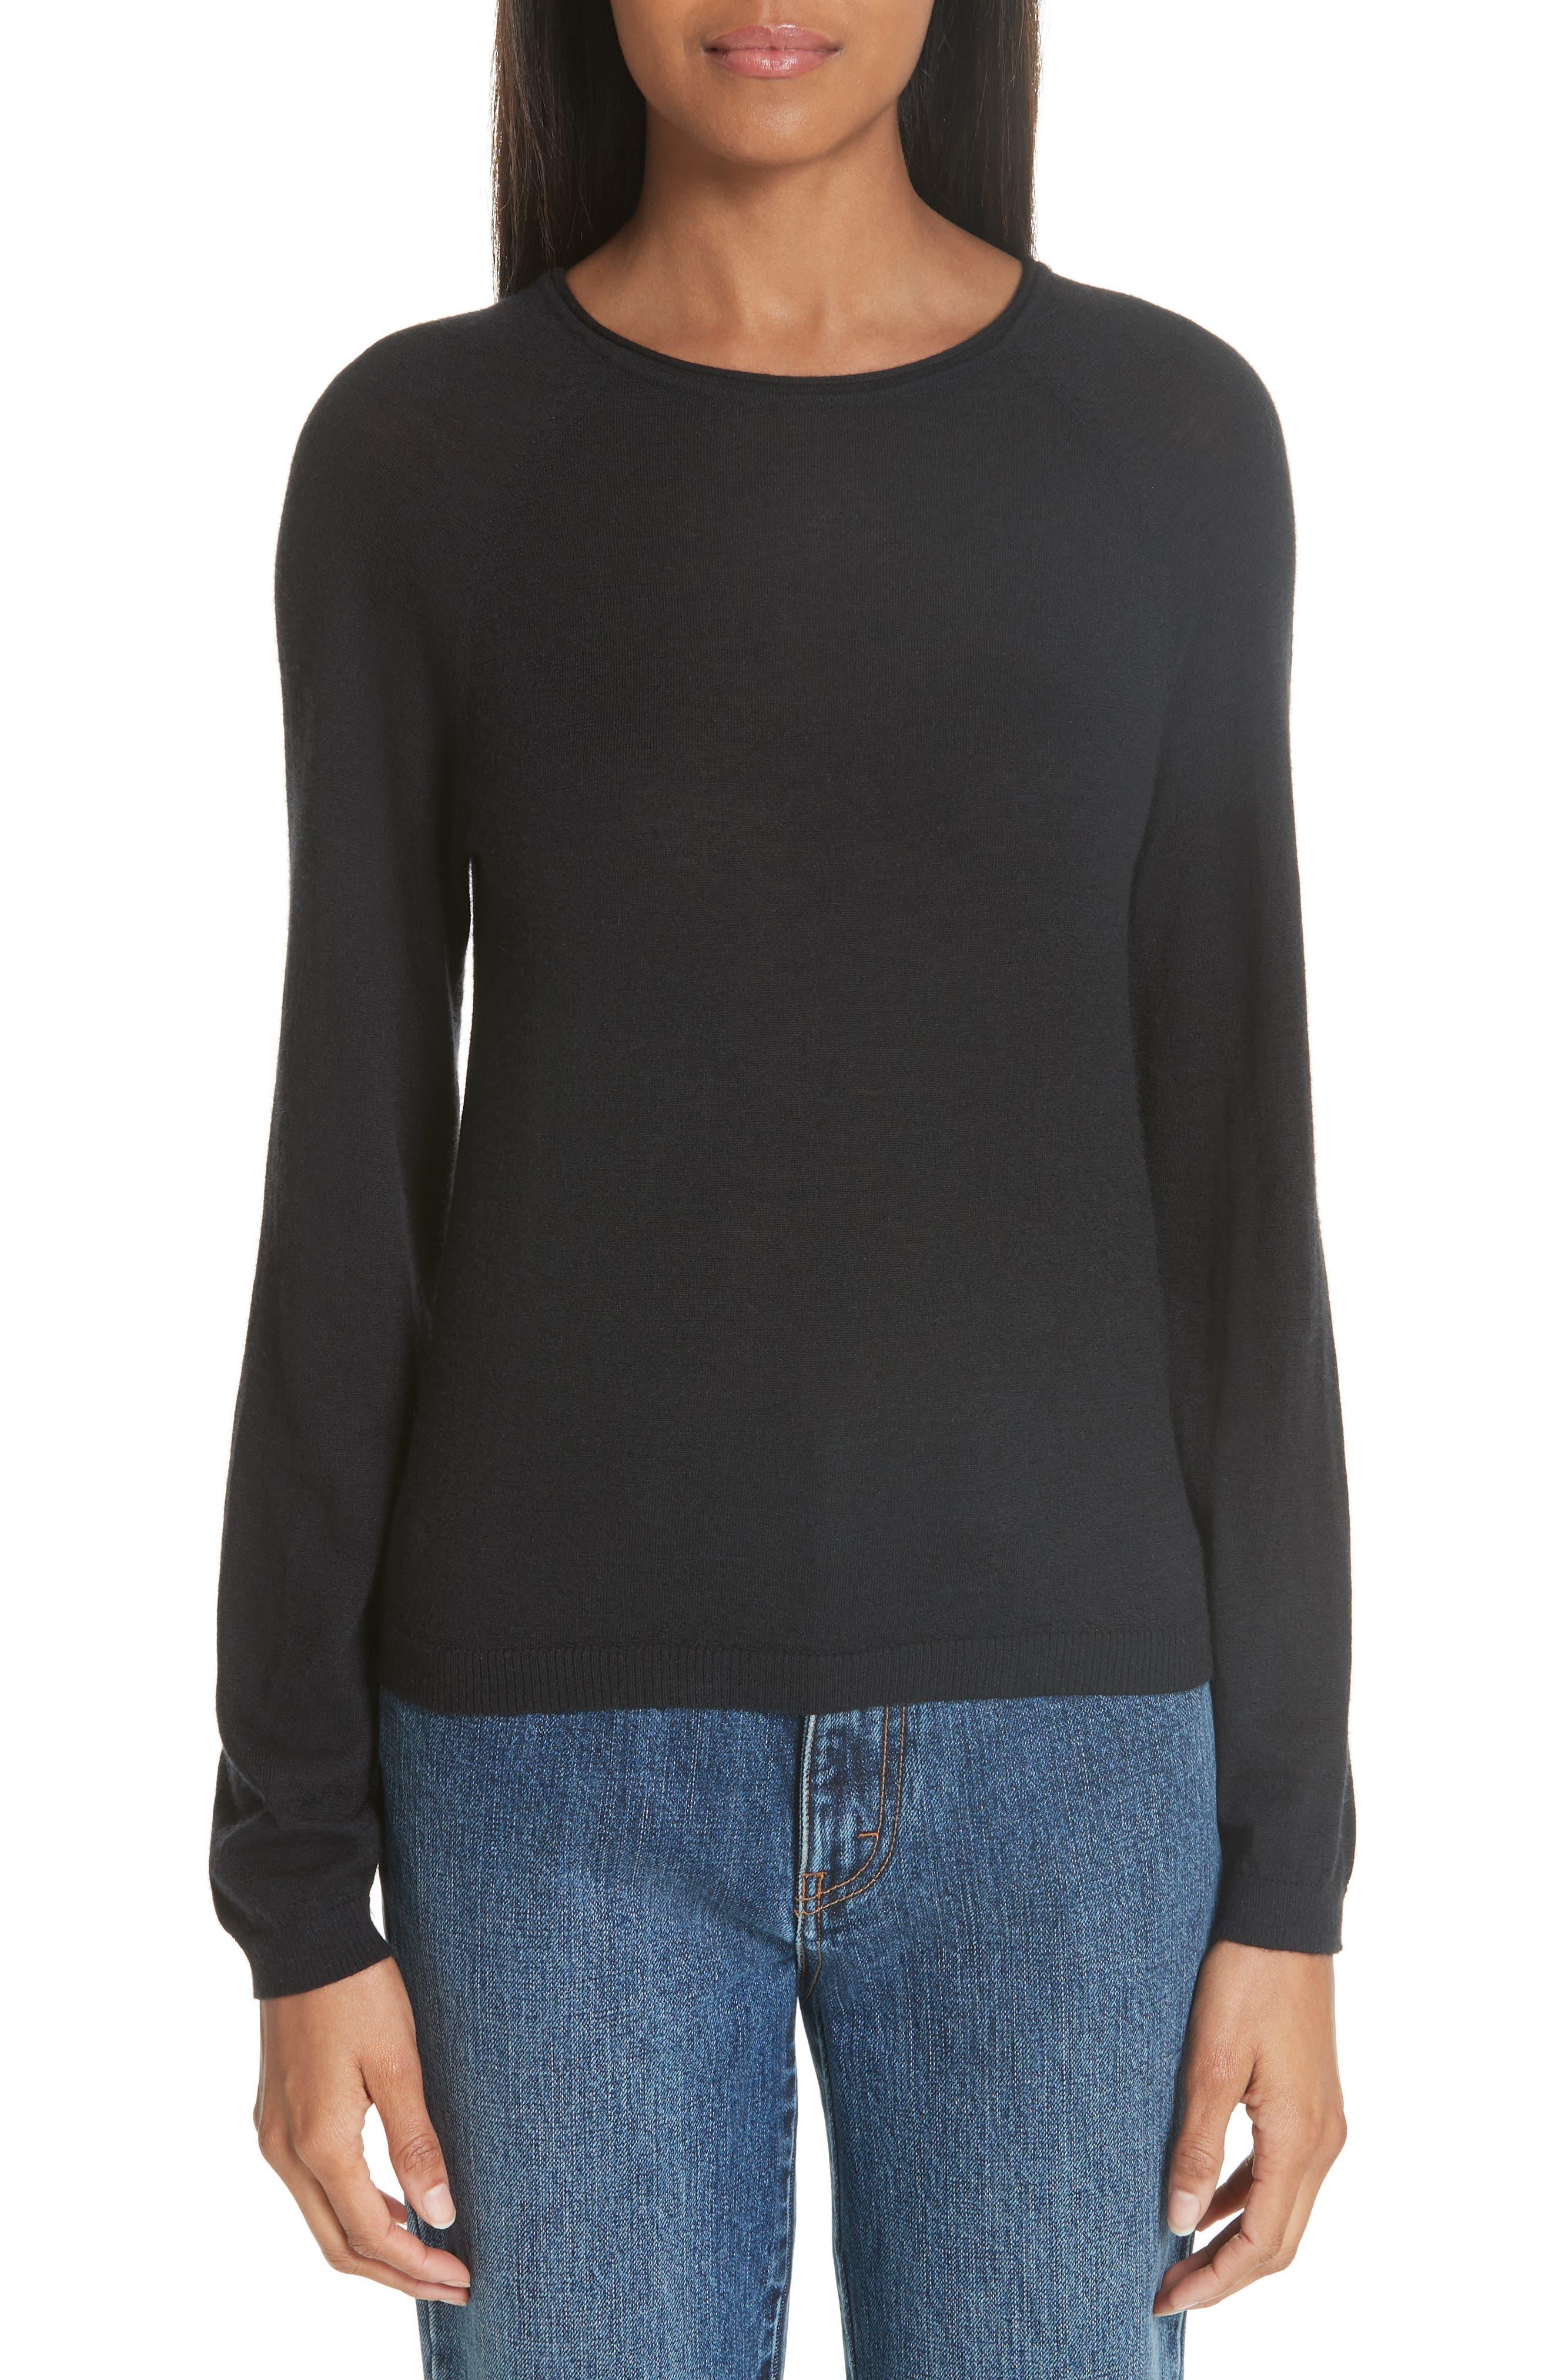 CO, Essentials Cashmere Sweater, Main thumbnail 1, color, BLACK